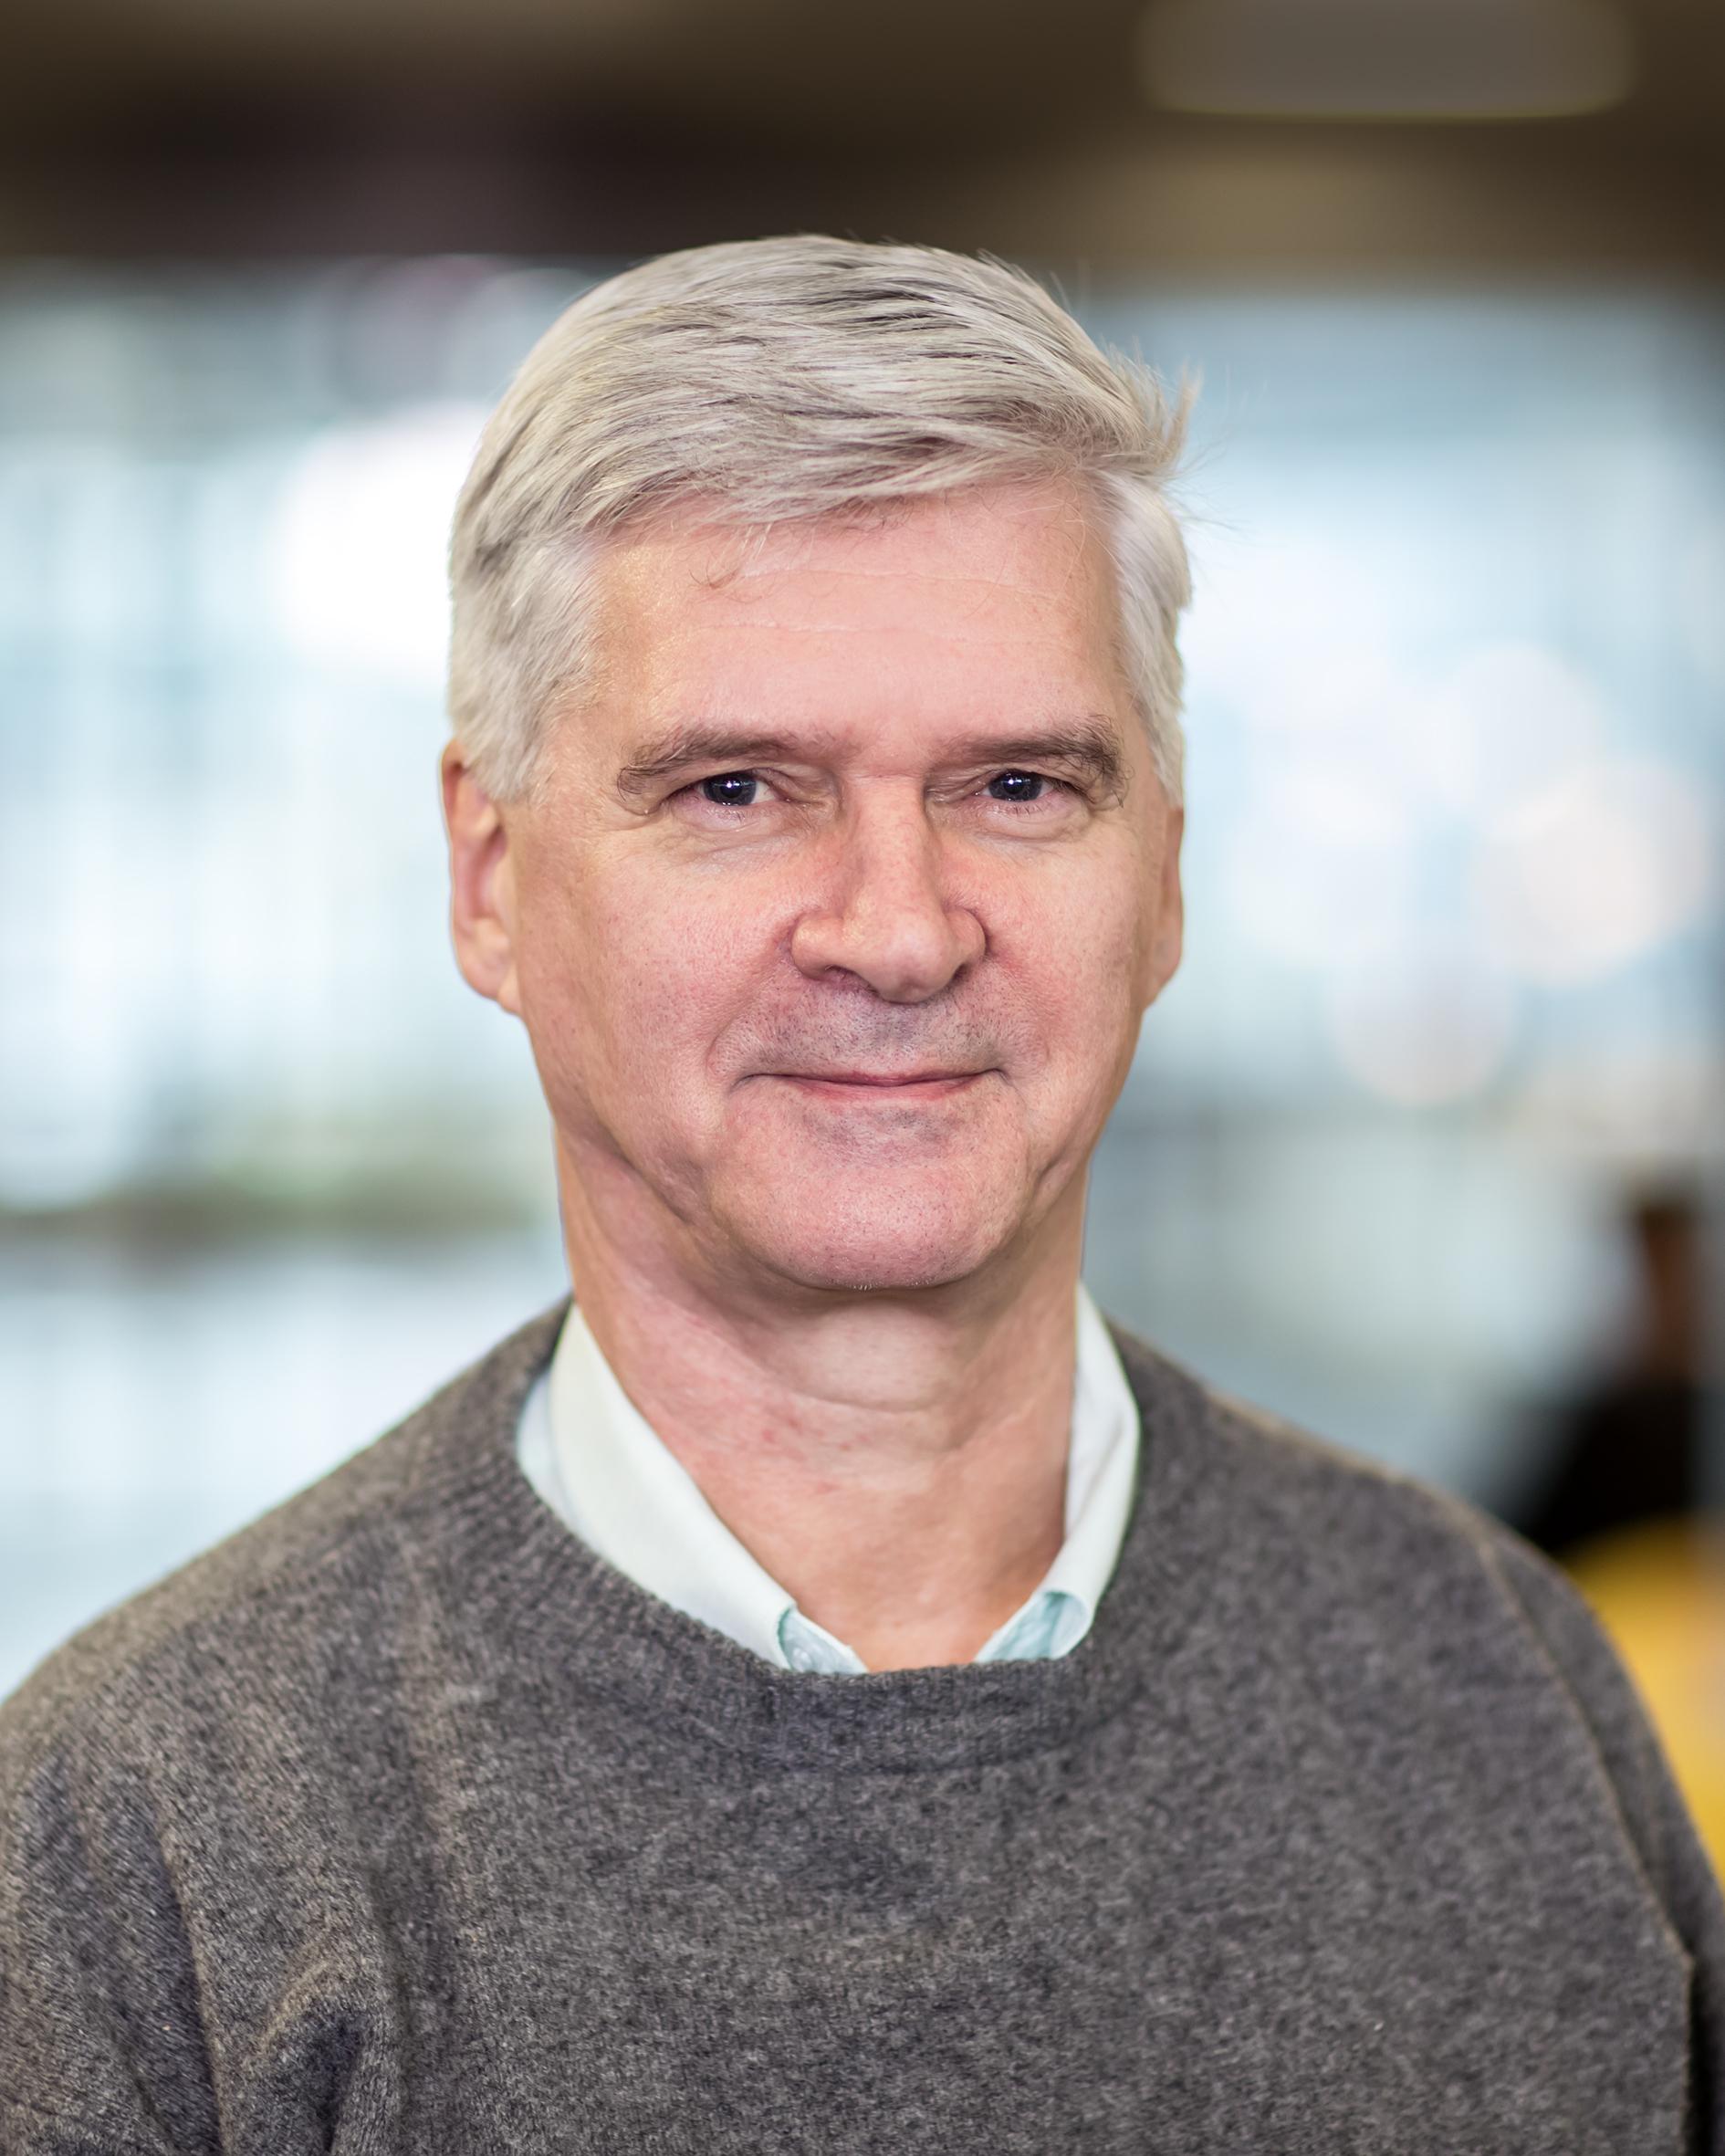 Geld, prof.dr. C.W.M. van der